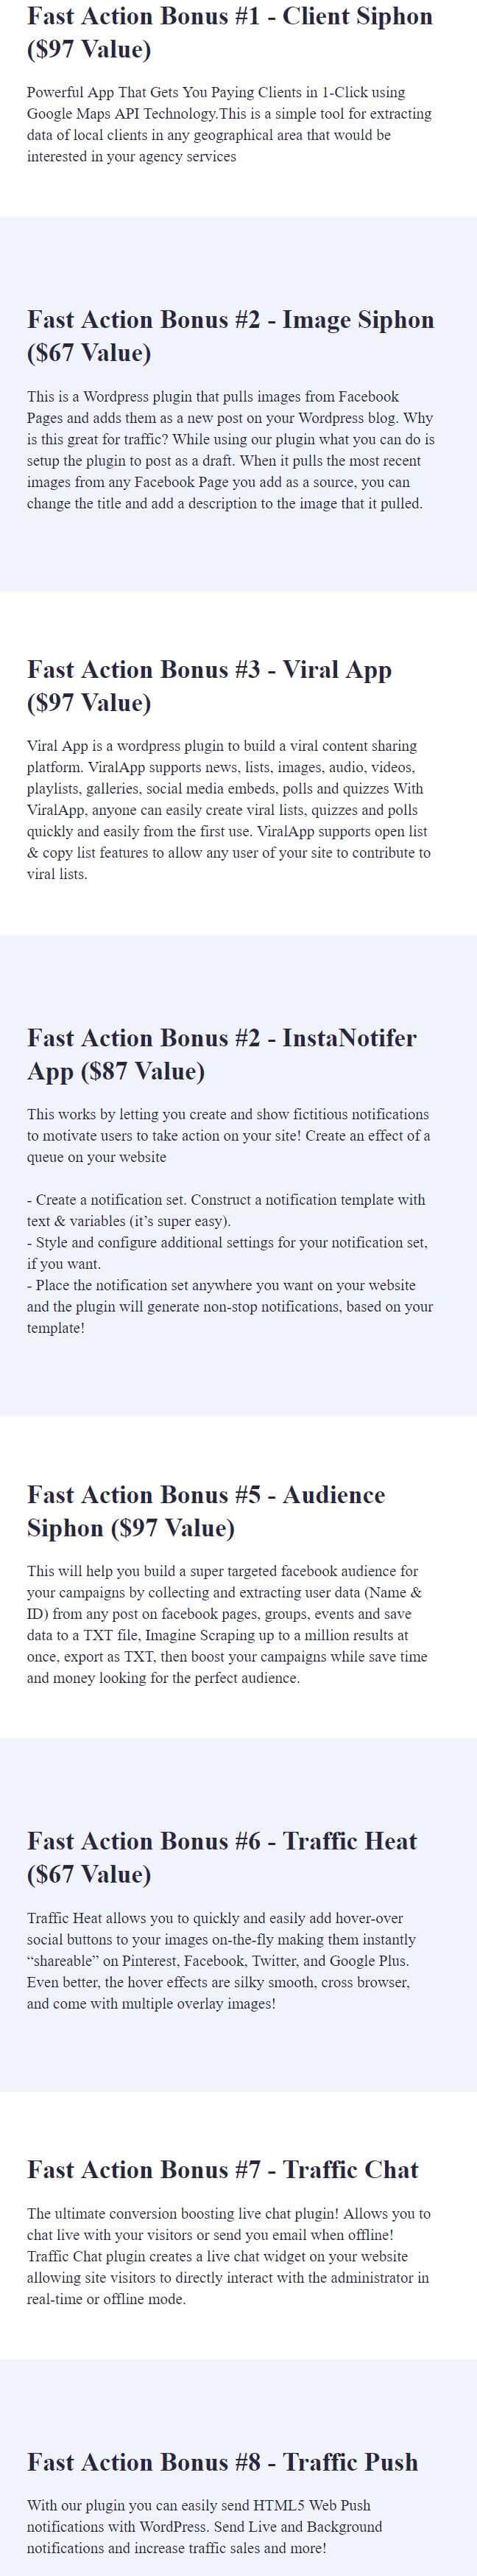 Siphon-App-Review-Bonus